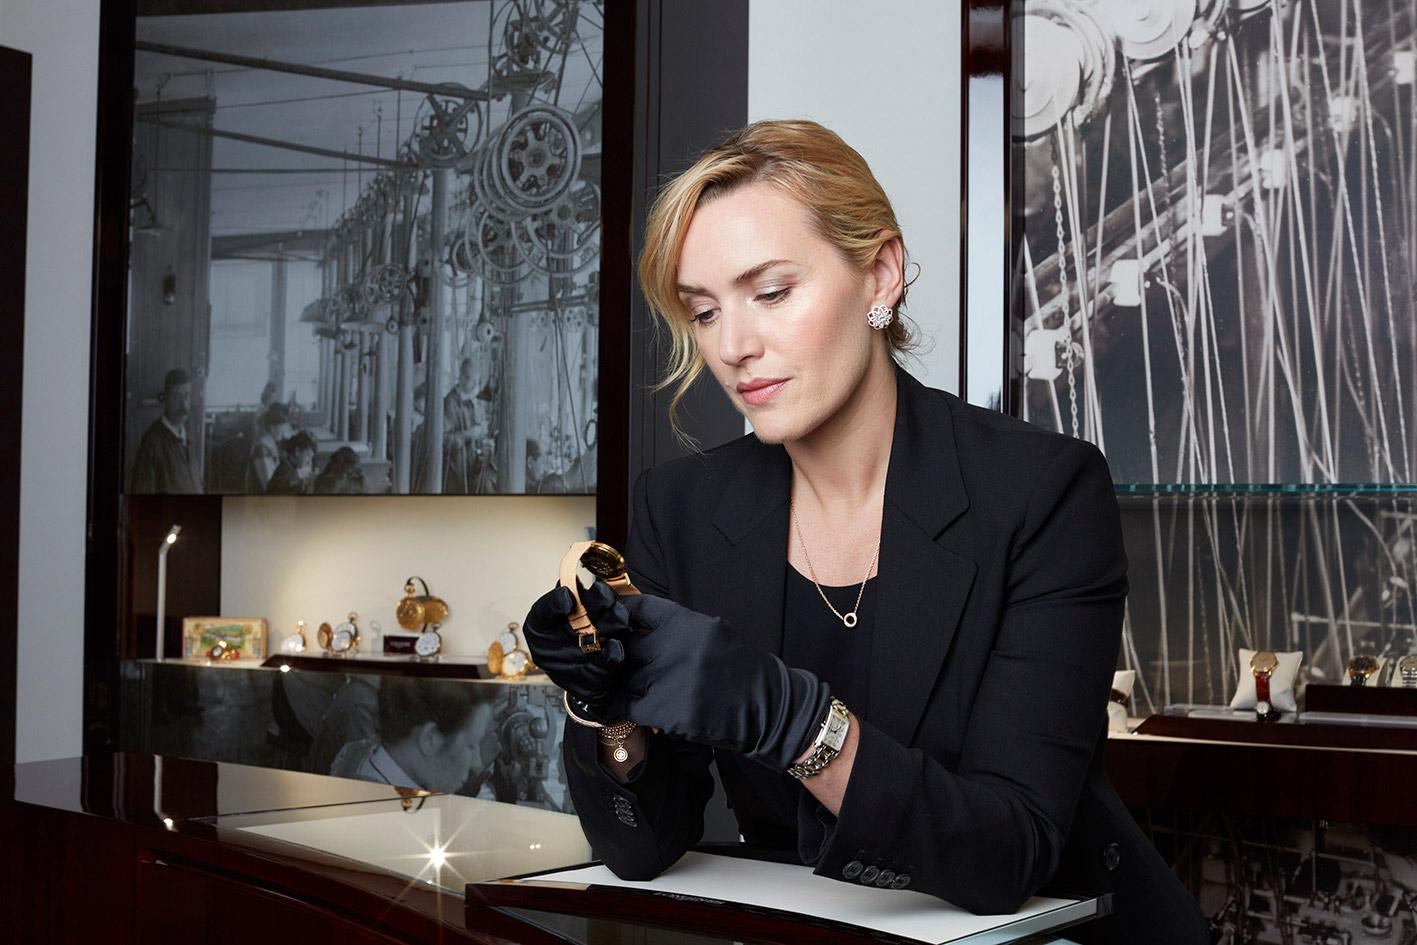 Switzerland Welcomes The Longines Ambassador Of Elegance Kate Winslett